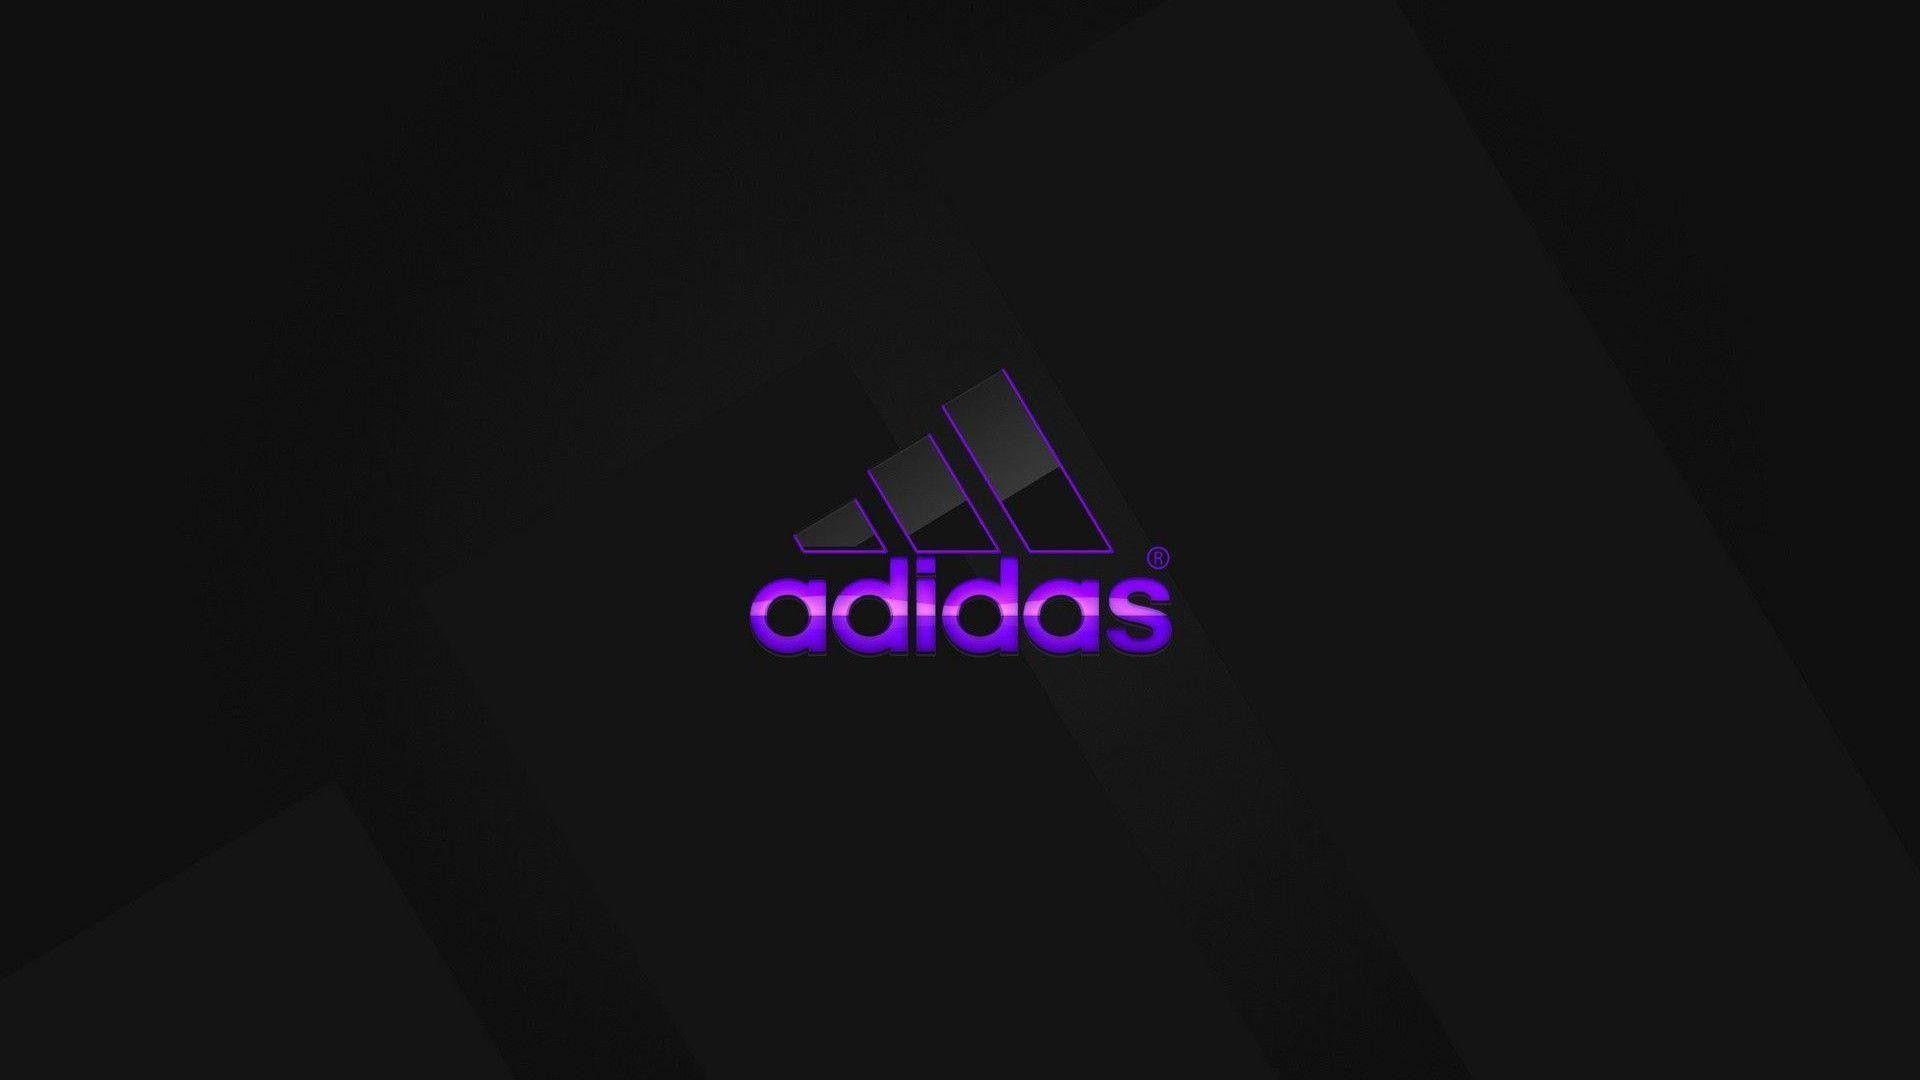 Adidas Hd Backgrounds 2020 Live Wallpaper Hd Adidas Logo Wallpapers Adidas Originals Logo Adidas Wallpapers